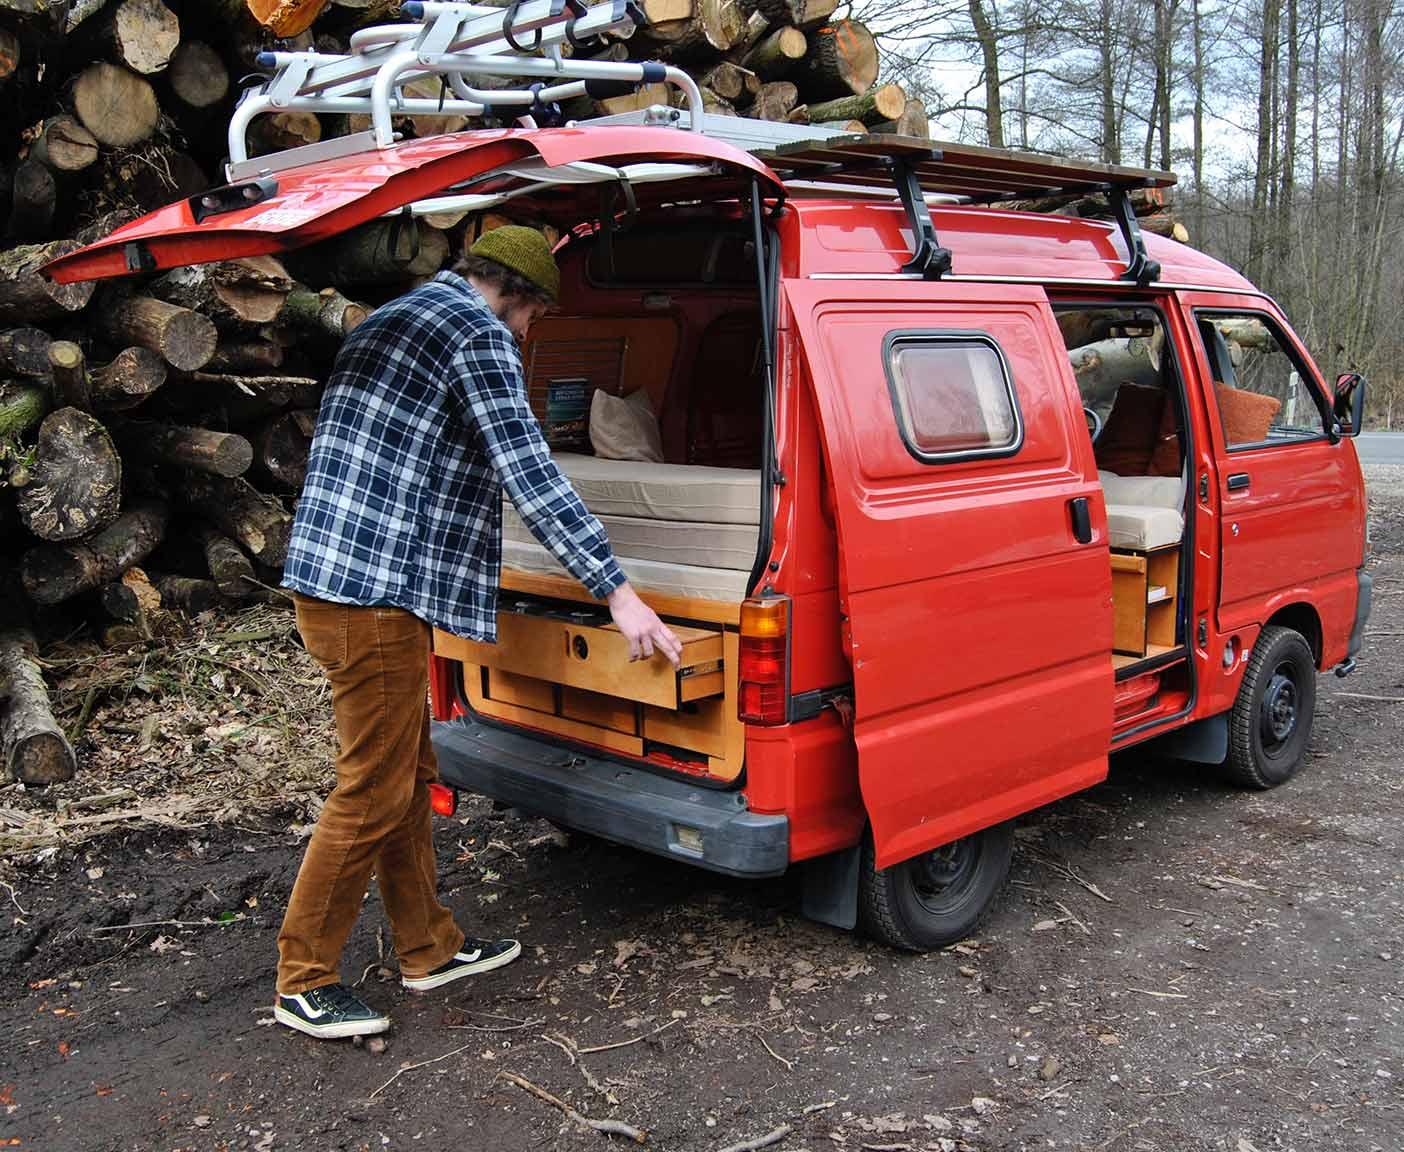 daihatsu hijet s85 der kleinste camper ausbau woodkali. Black Bedroom Furniture Sets. Home Design Ideas